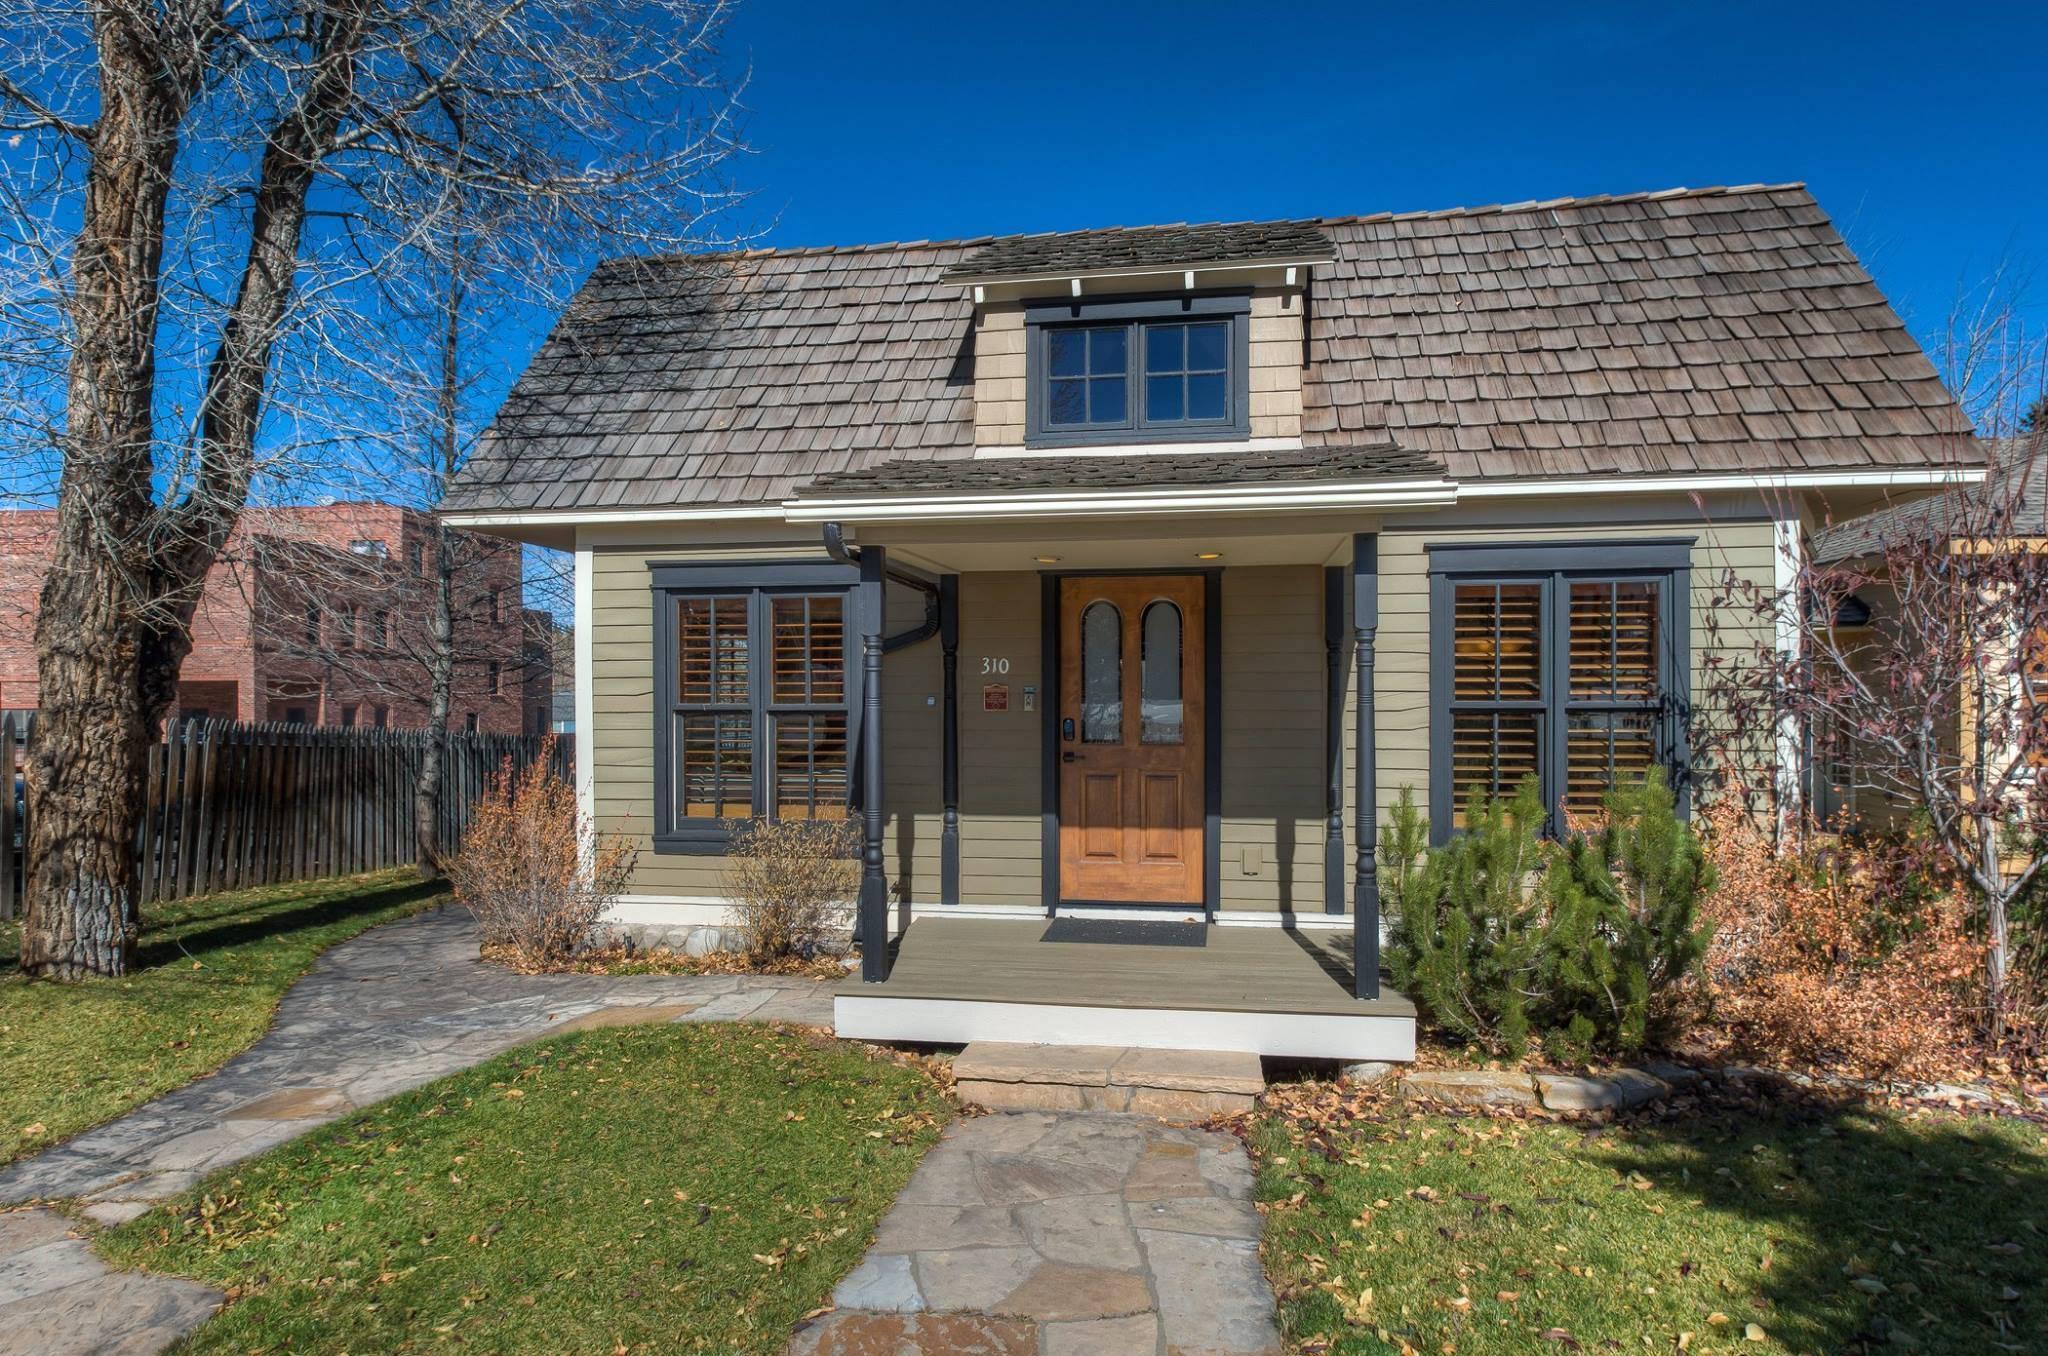 Cottage: Exterior